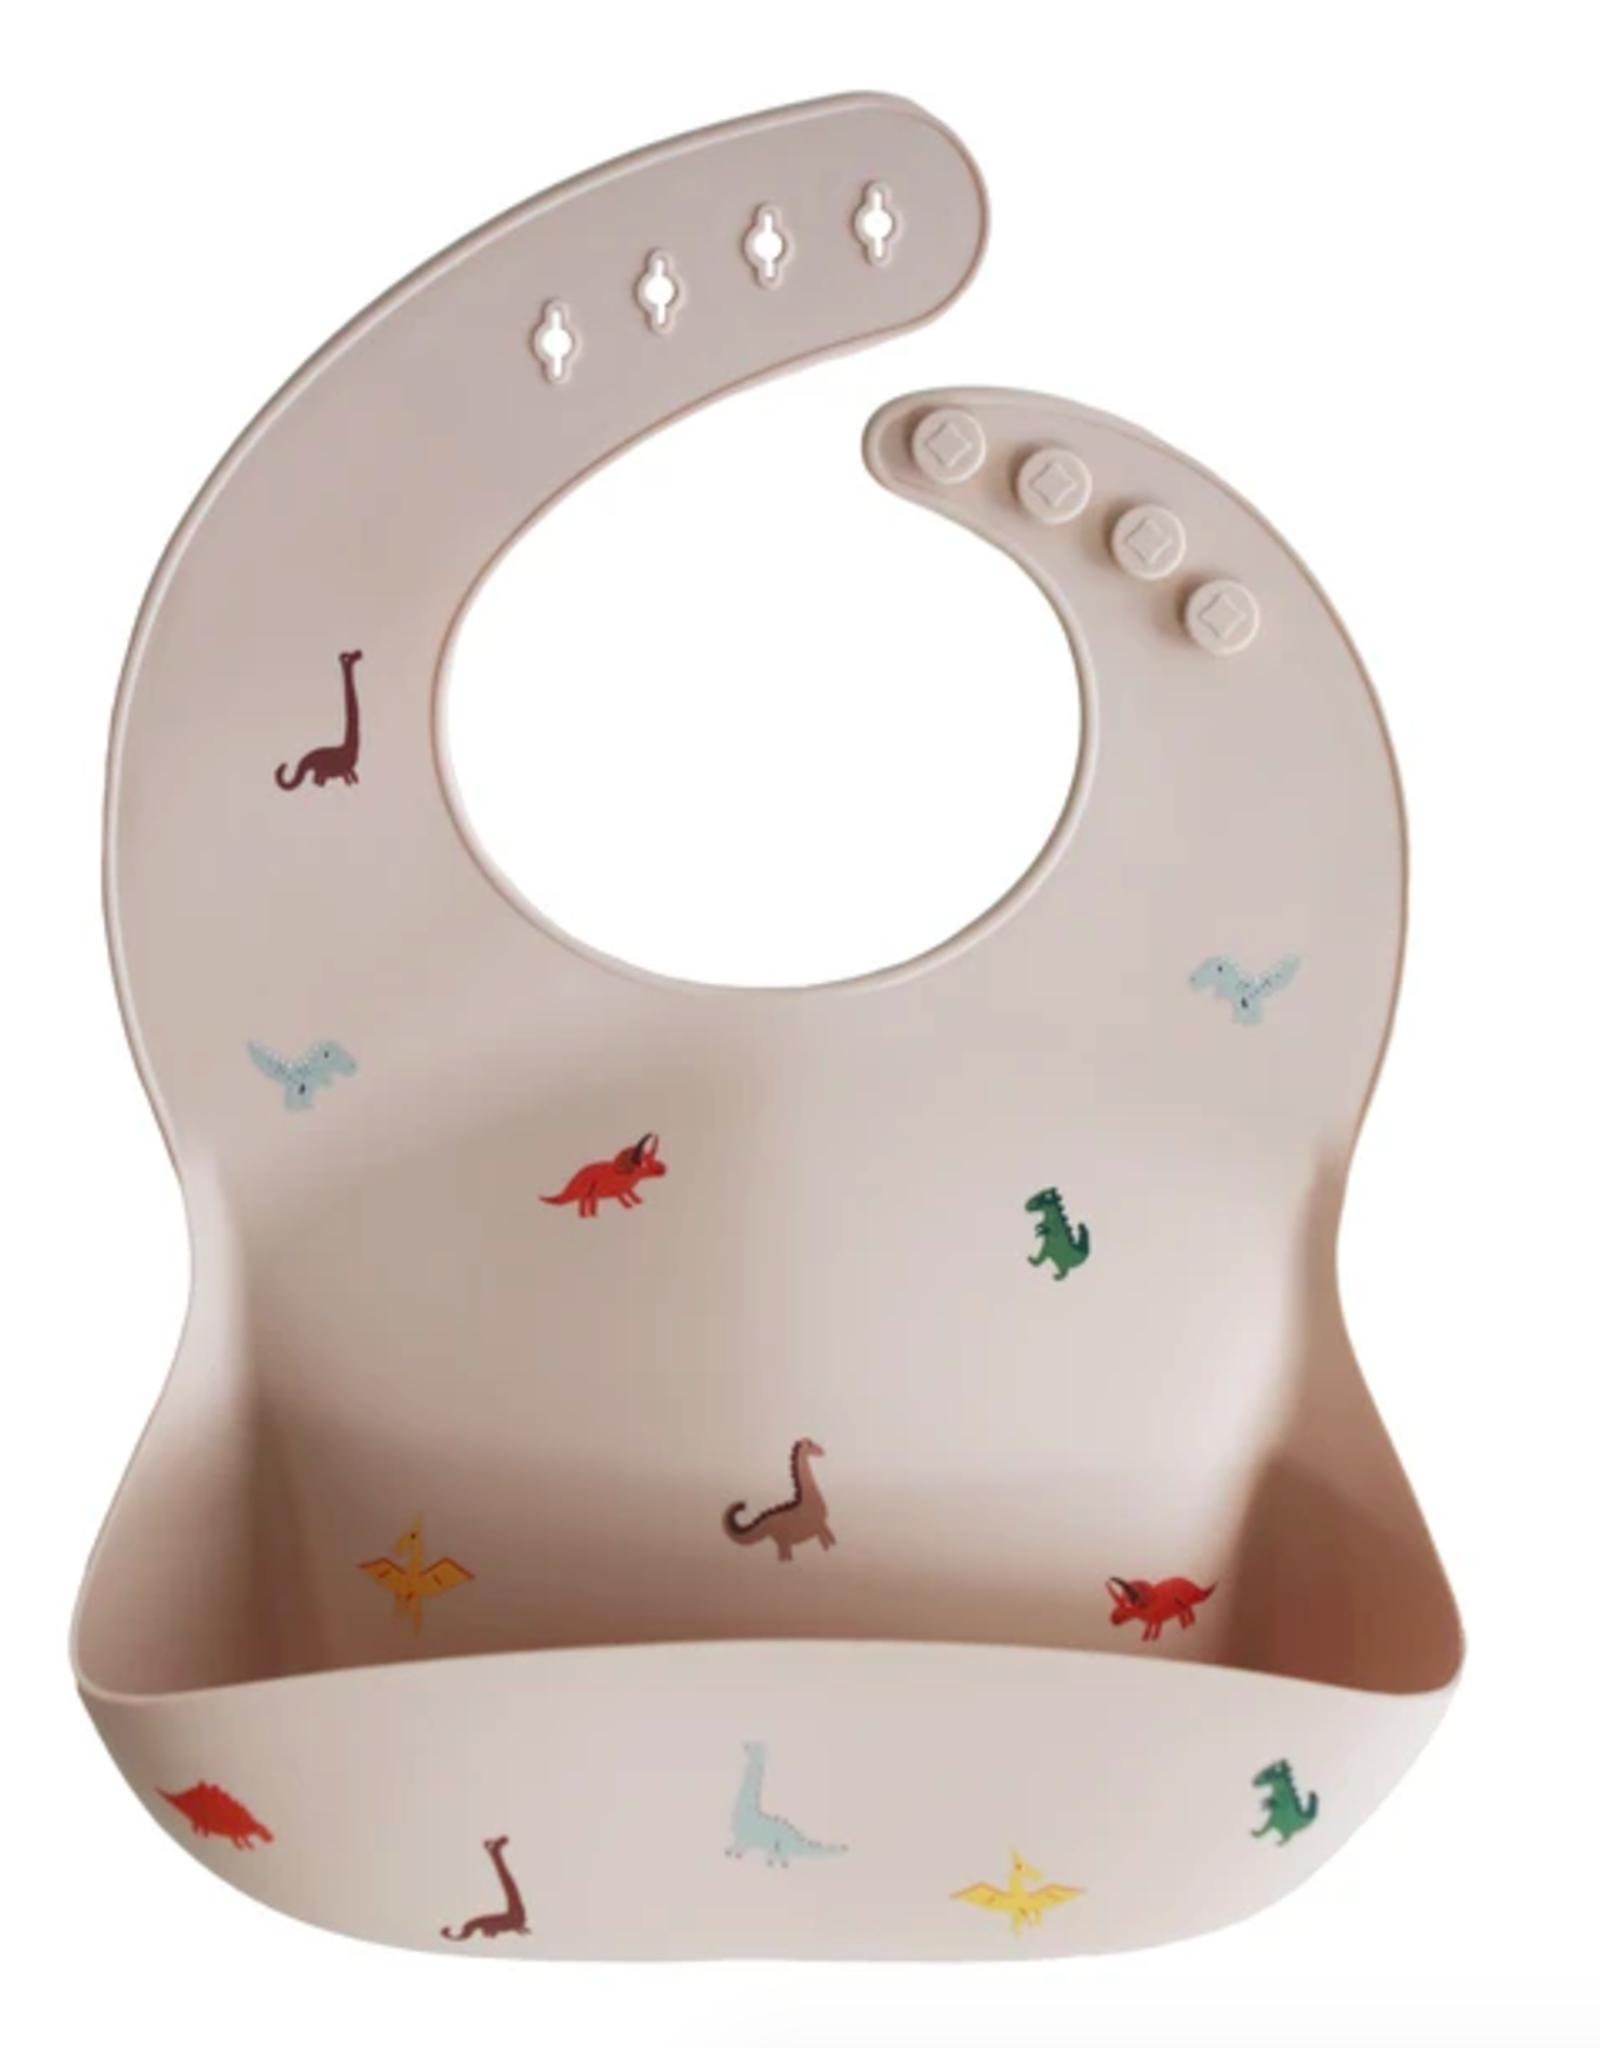 Silicone Baby Bib - Dinosaurs